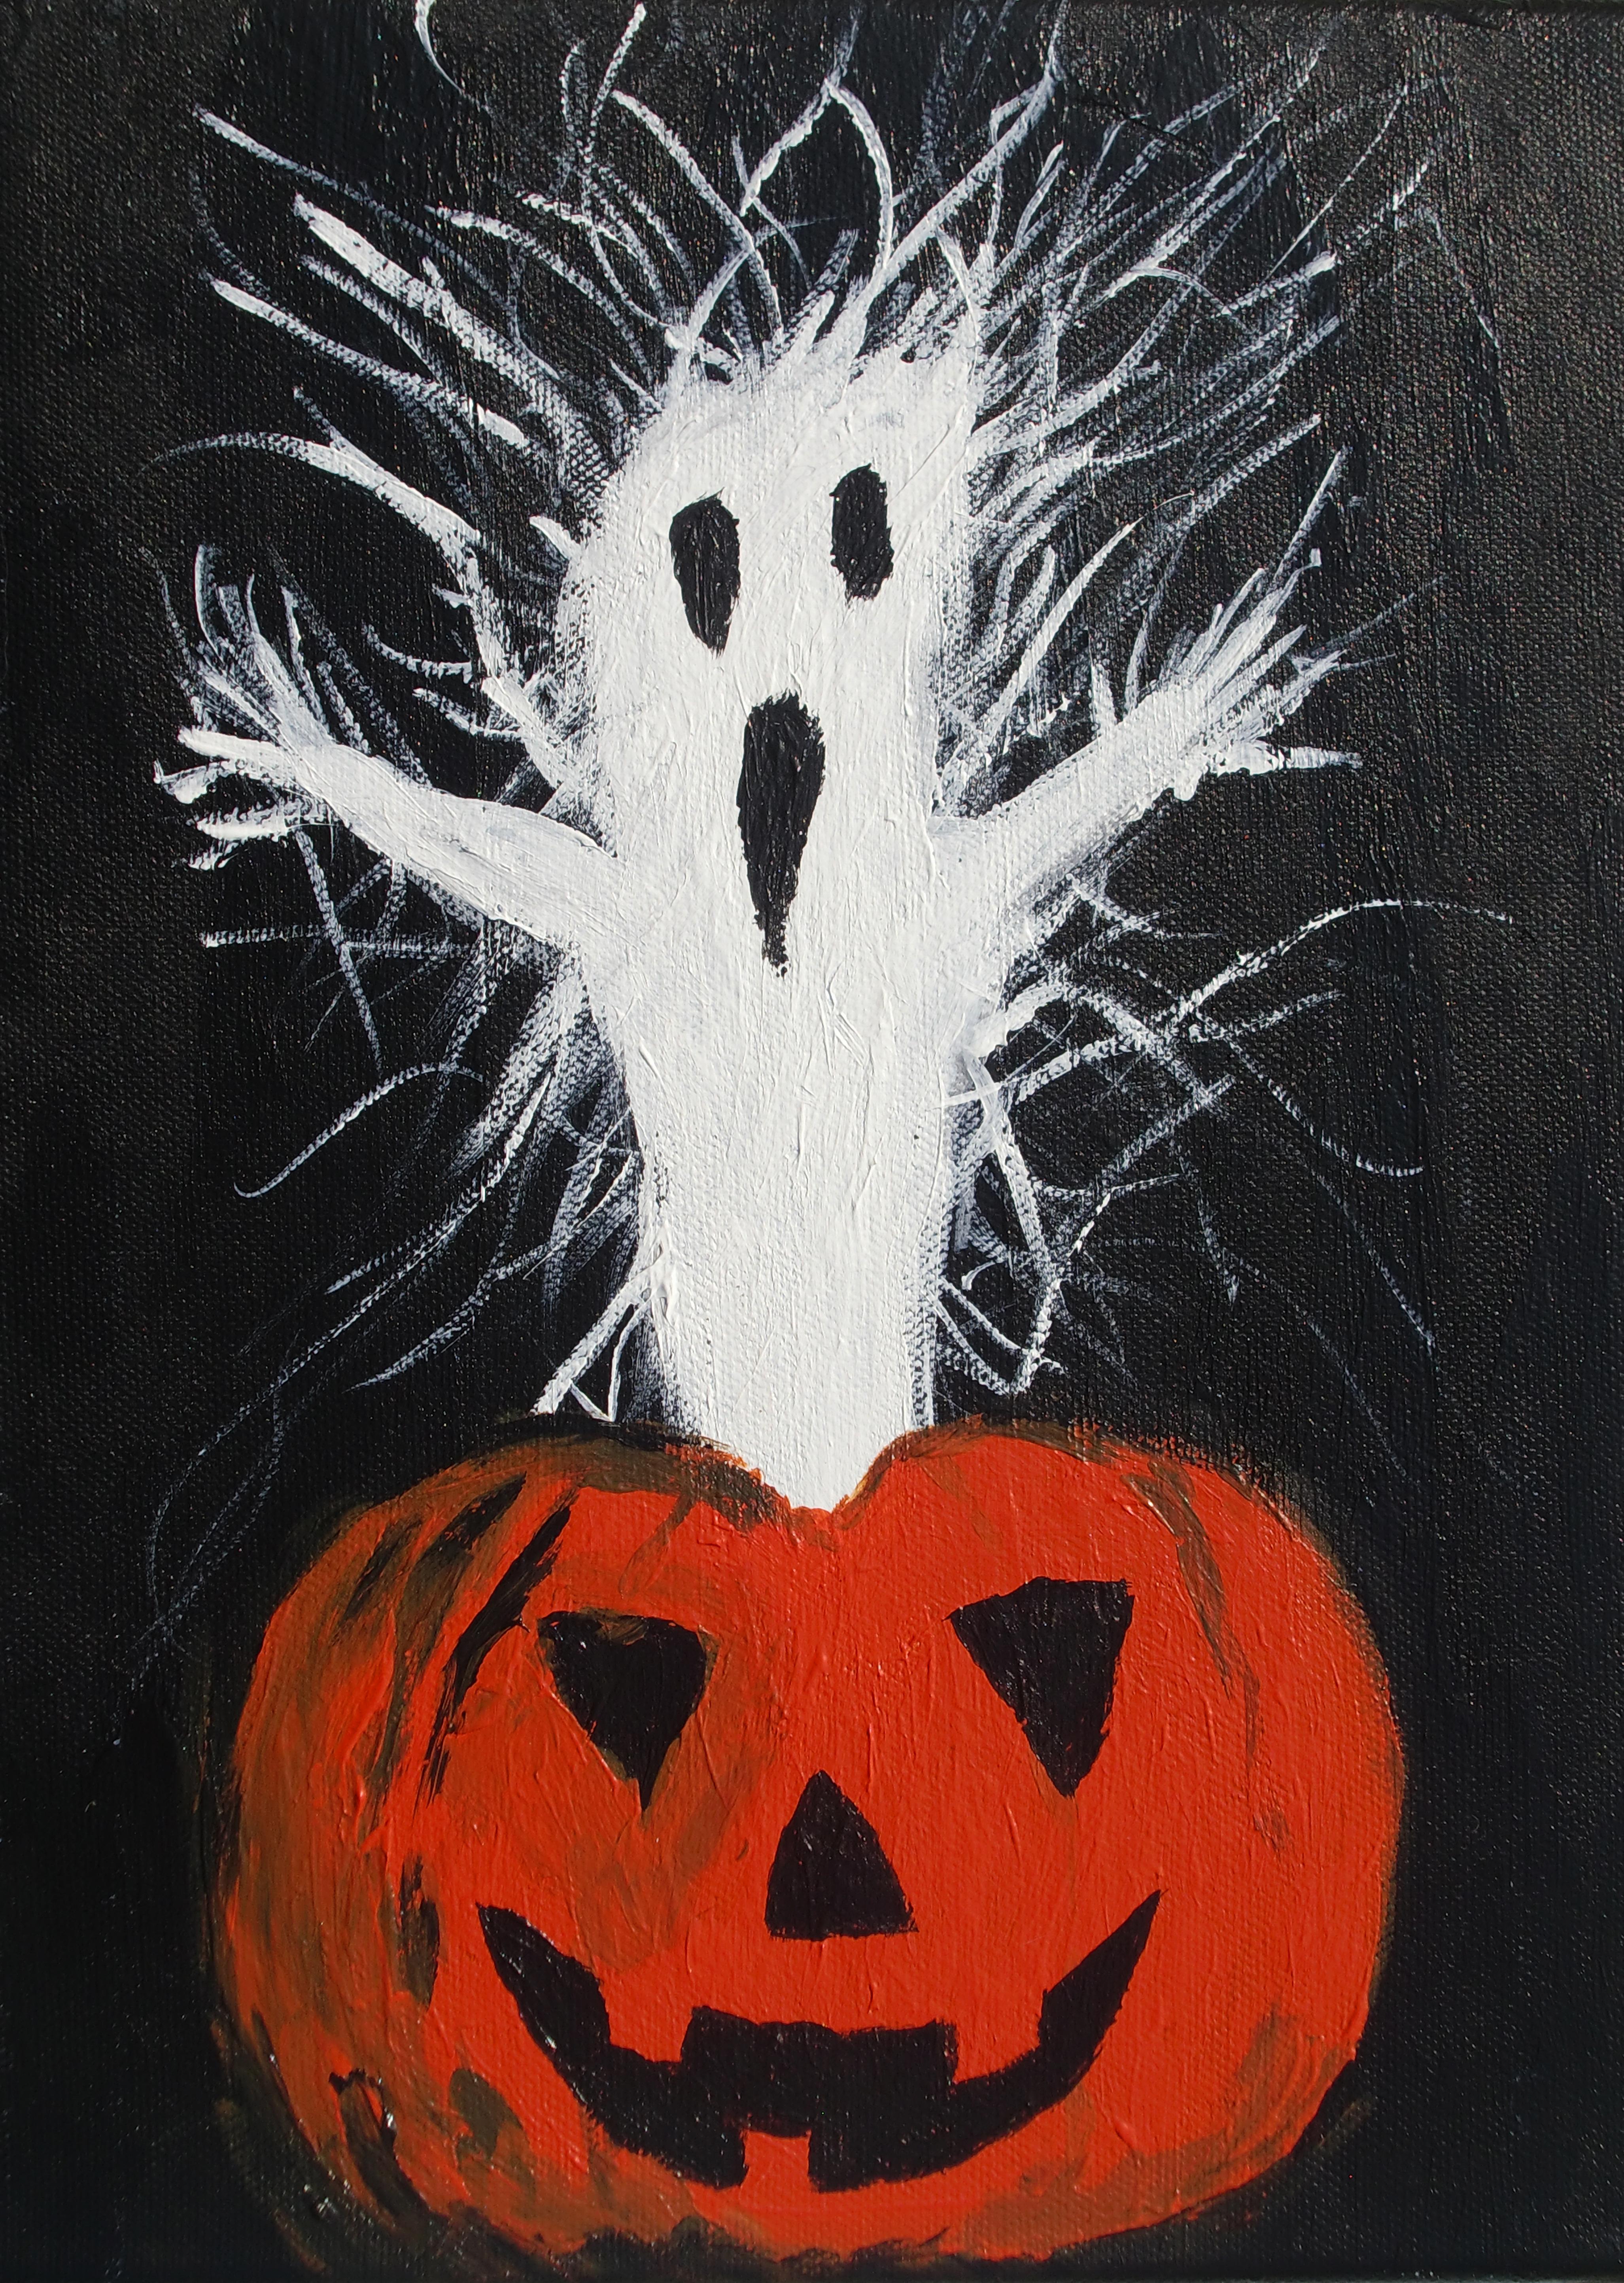 www.uglyheadmusic.com - News - Uglyhead Halloween Sounds Vol. 1 ...